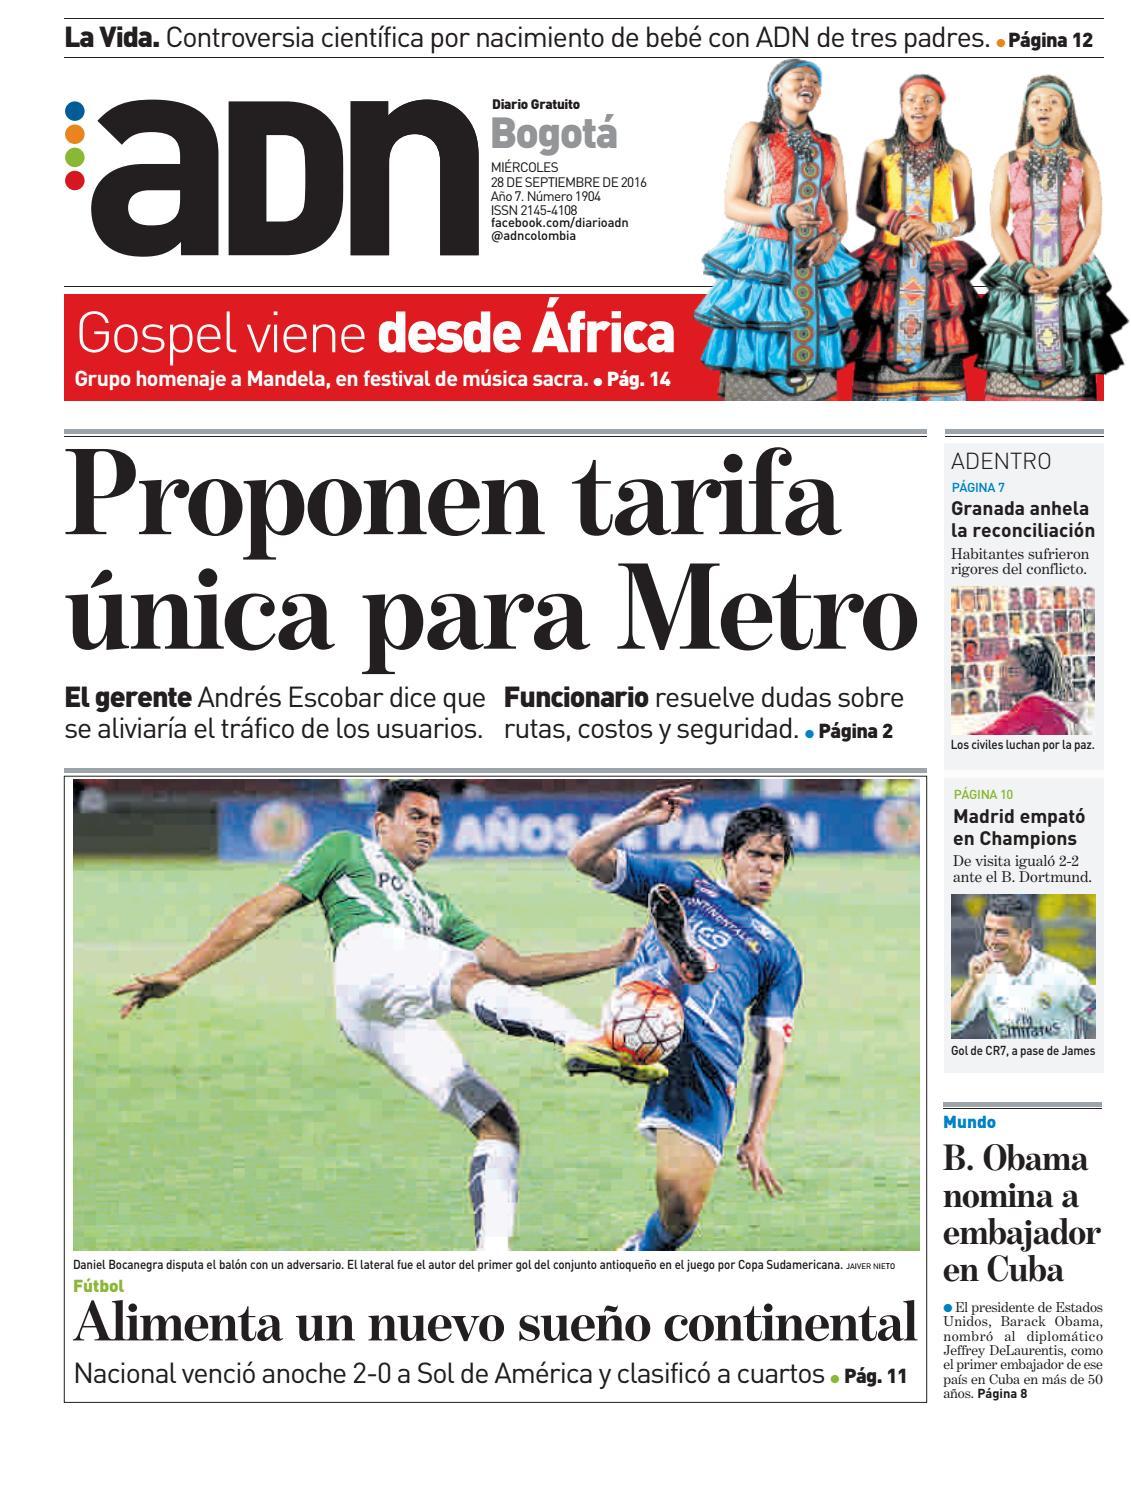 ADN Bogotá, Septiembre 28 de 2016 by diarioadn.co - issuu